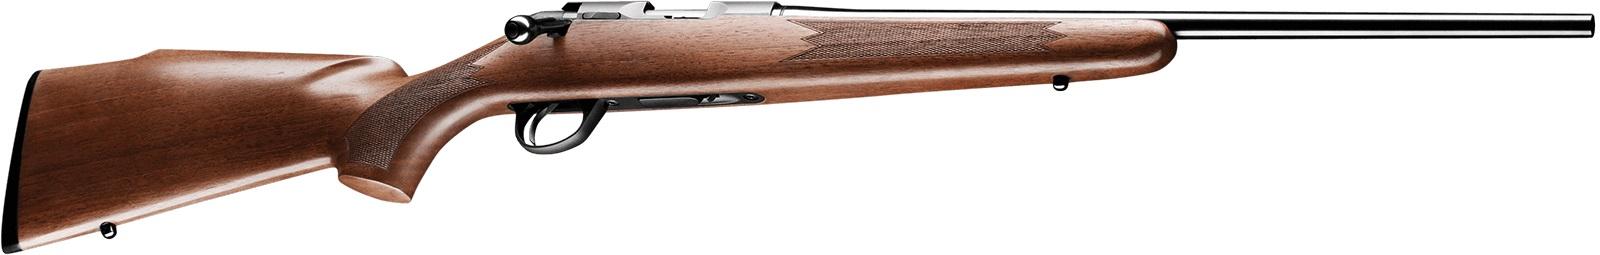 Sako Finnfire 2 Hunter Pro22LR